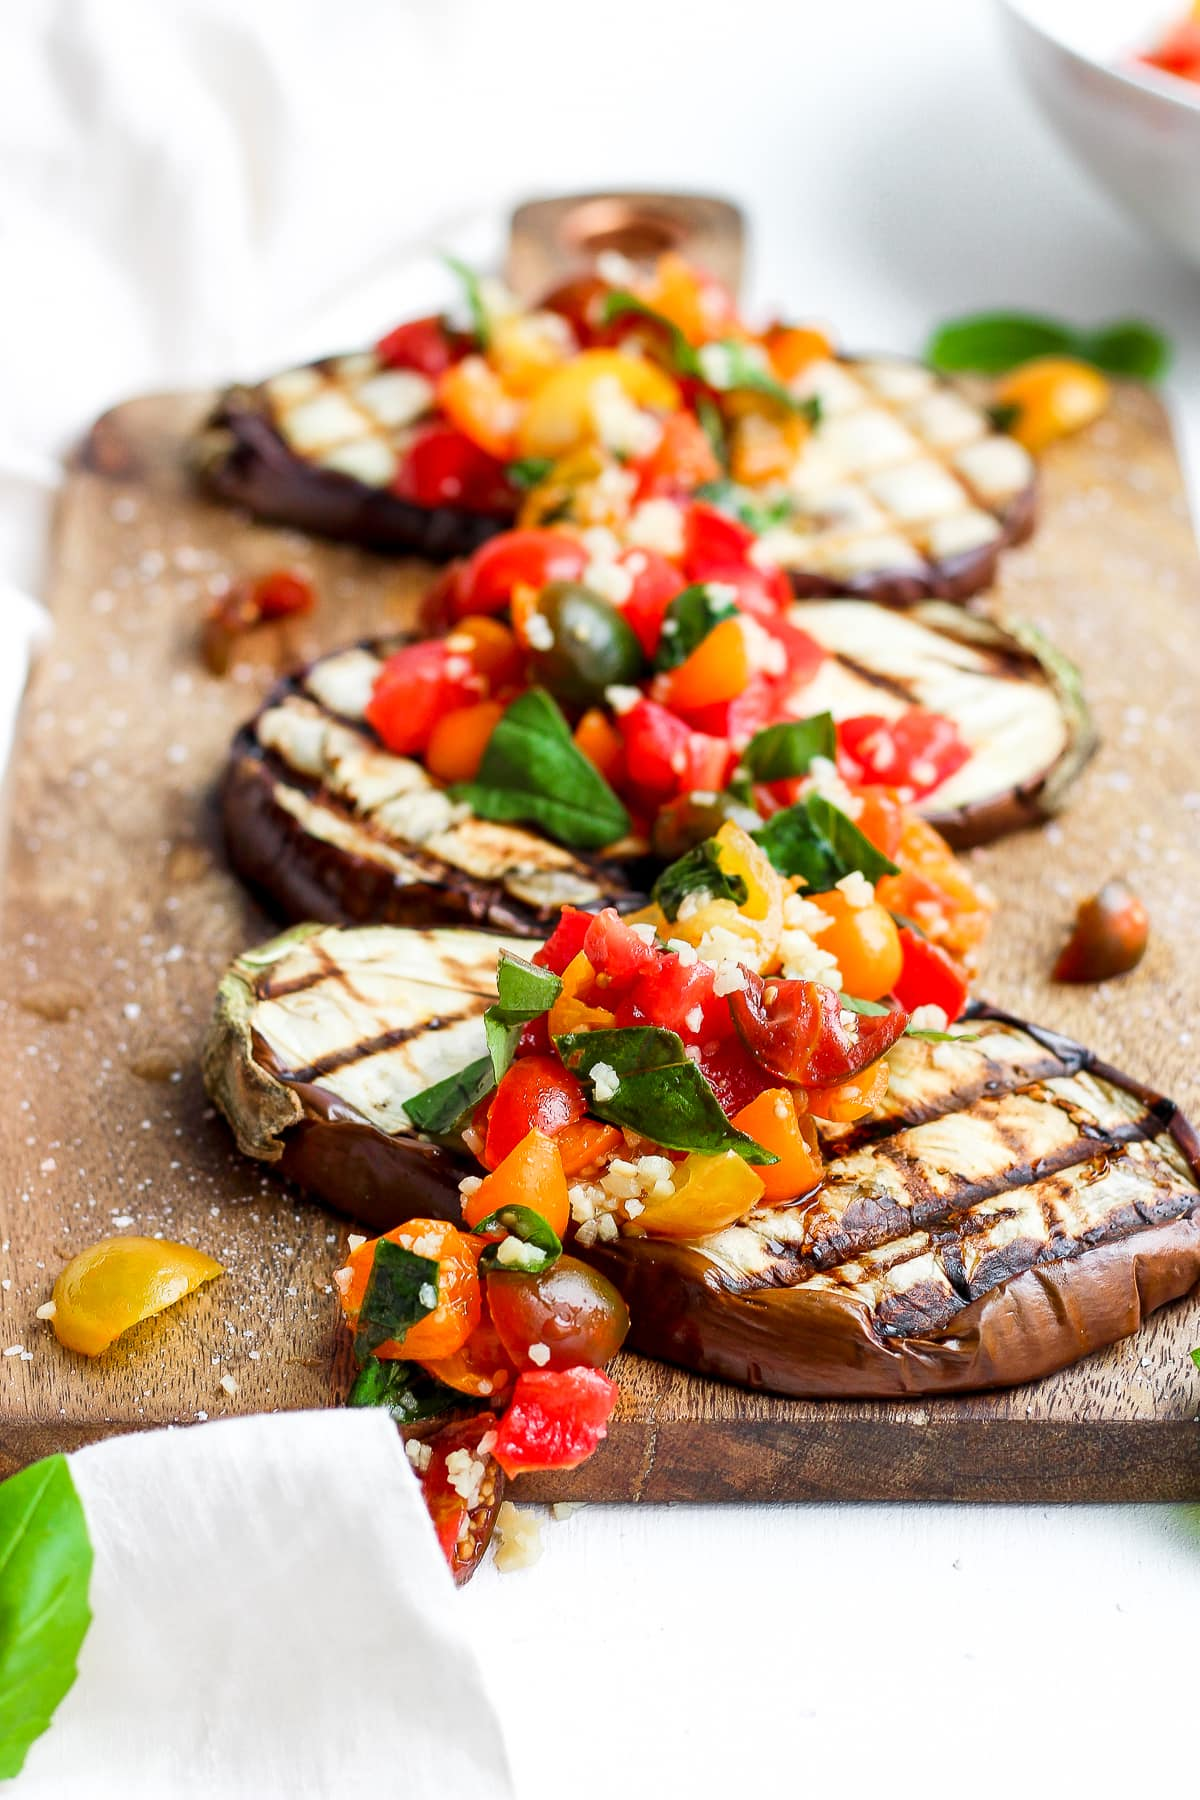 Eggplant Bruschetta on a wooden board.